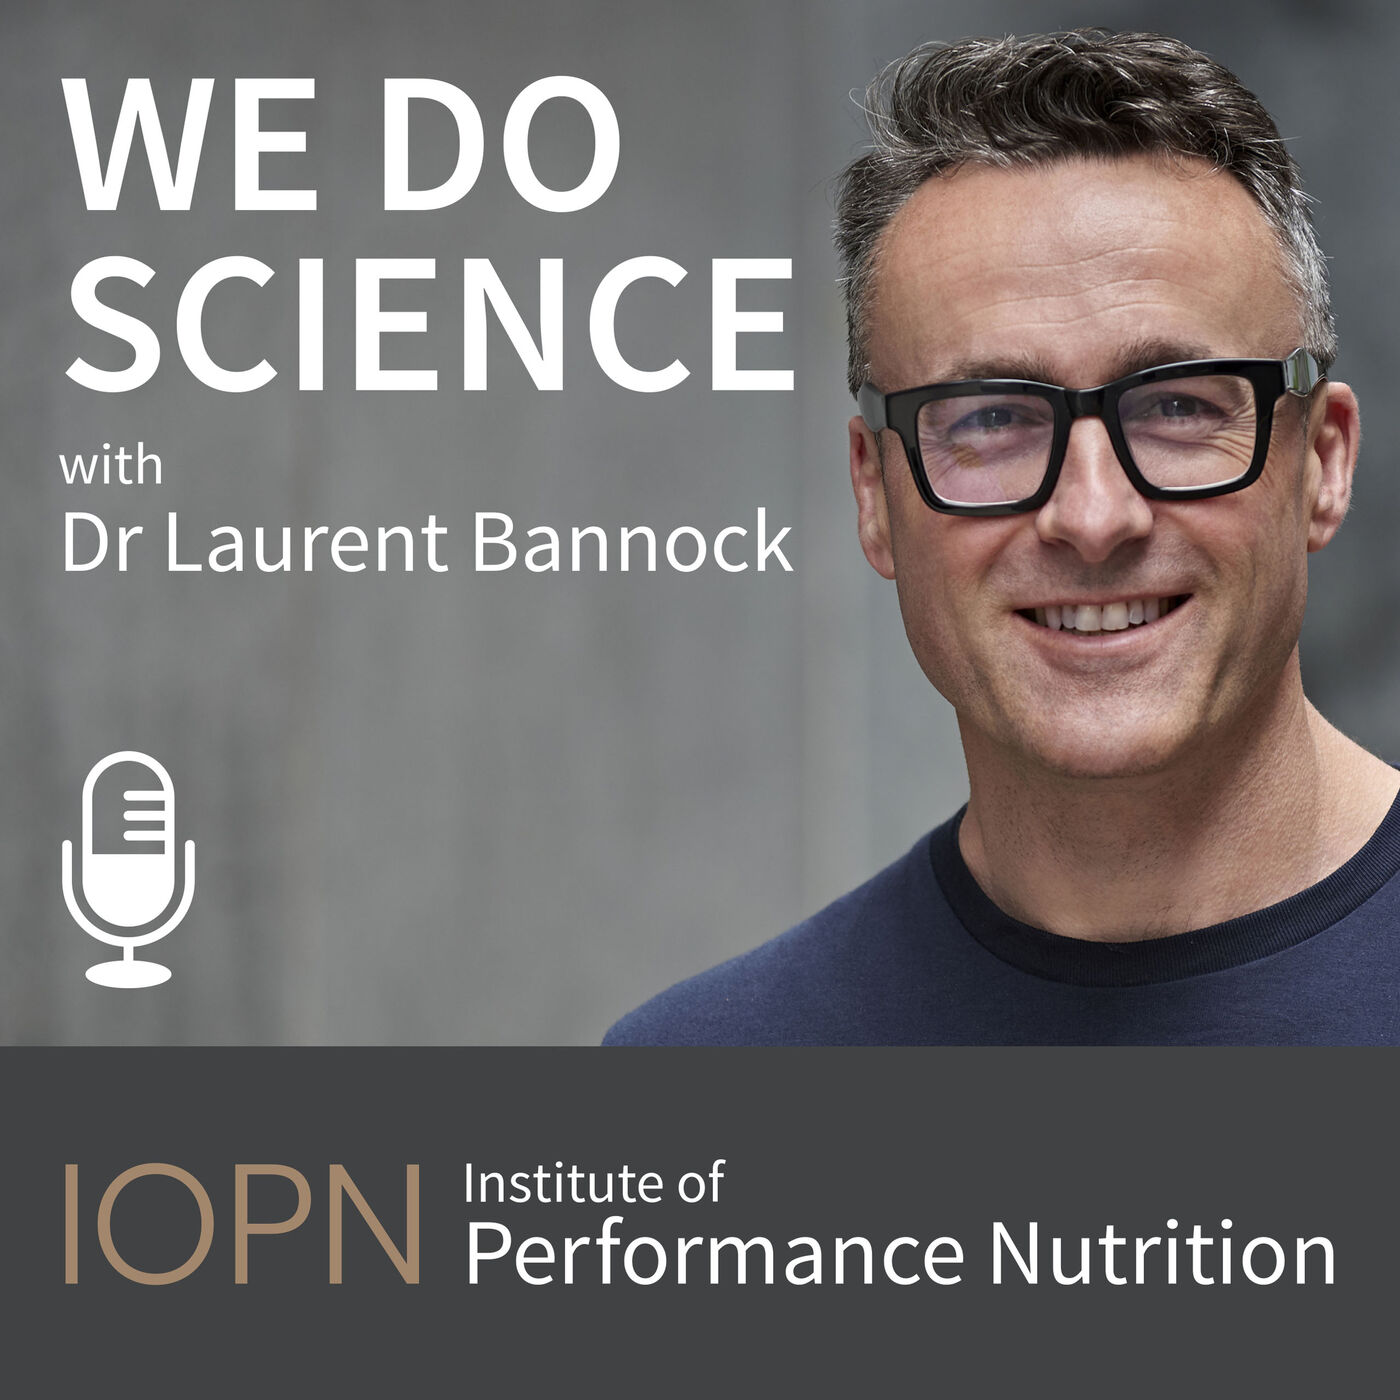 Episode 32 - 'Fluid Balance & Performance' with Ben Jones PhD